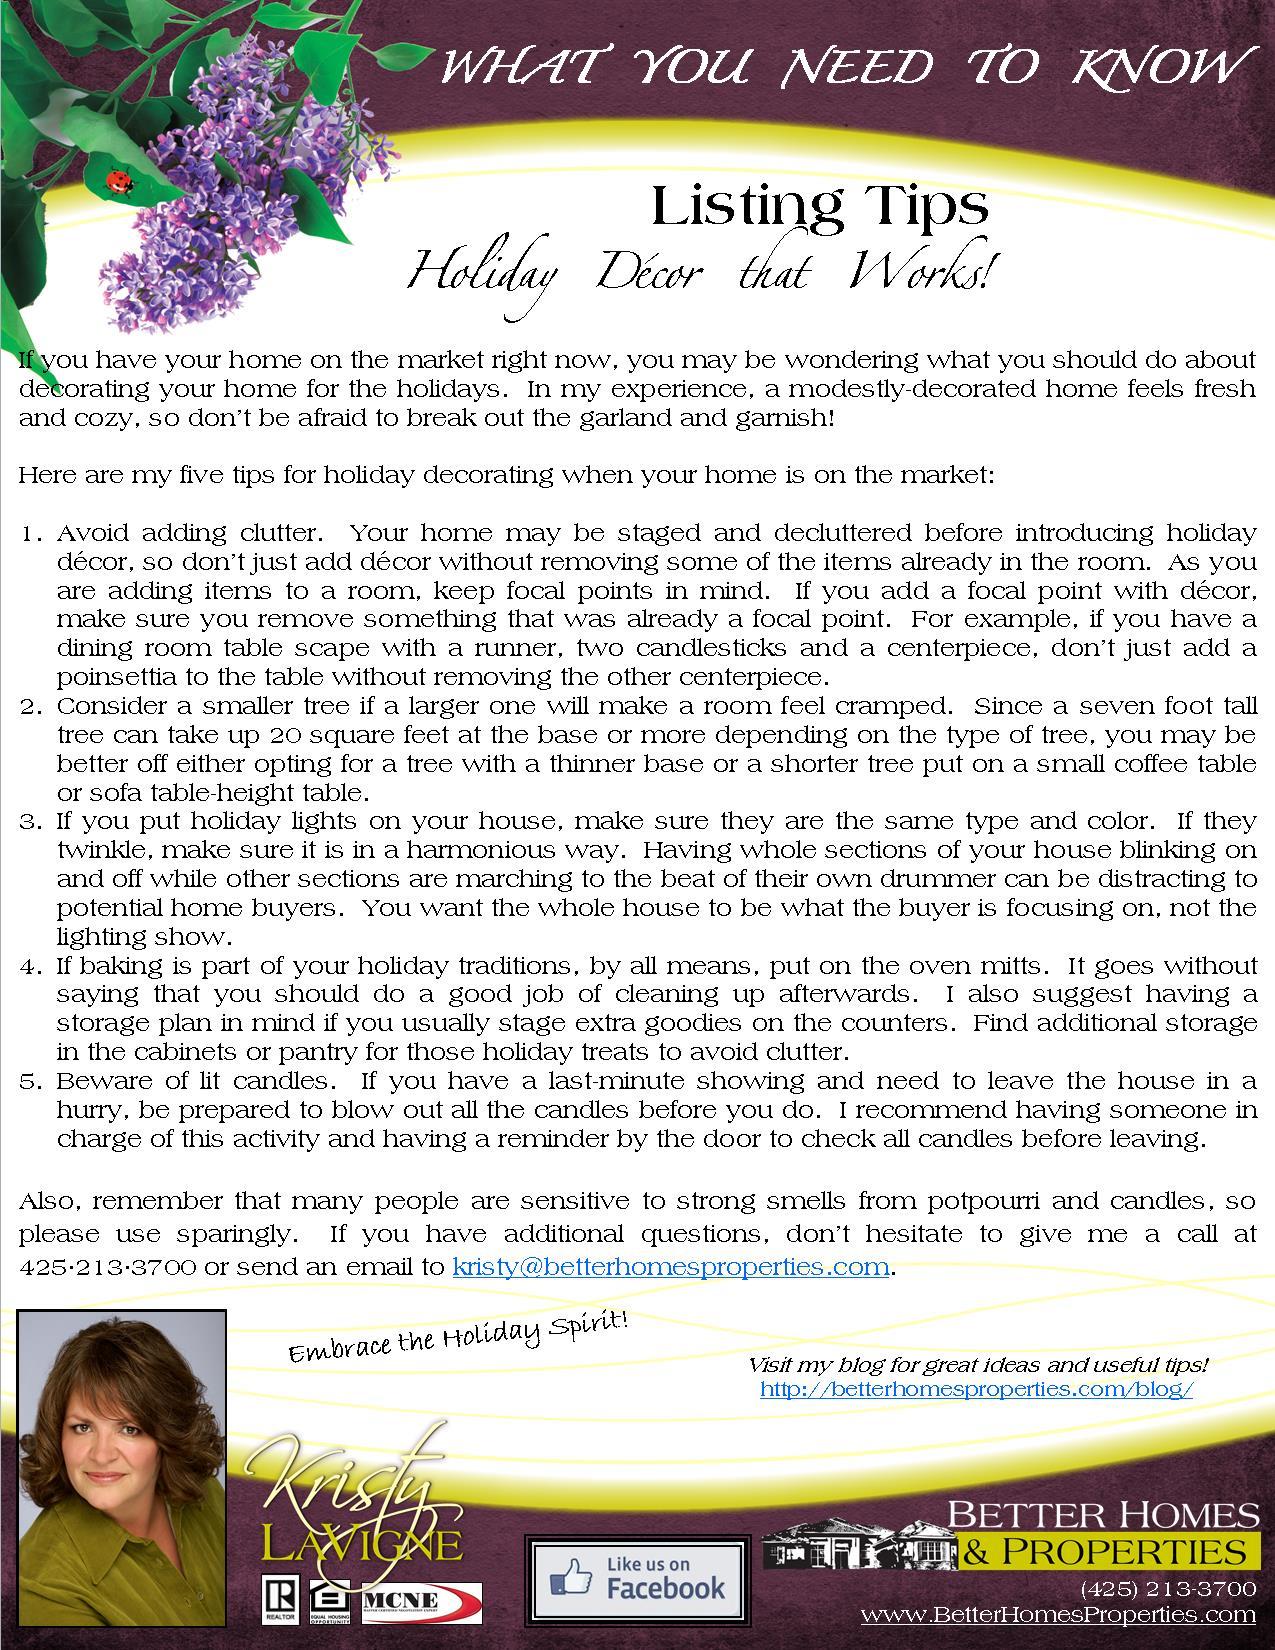 Holiday Decor Listing Tips